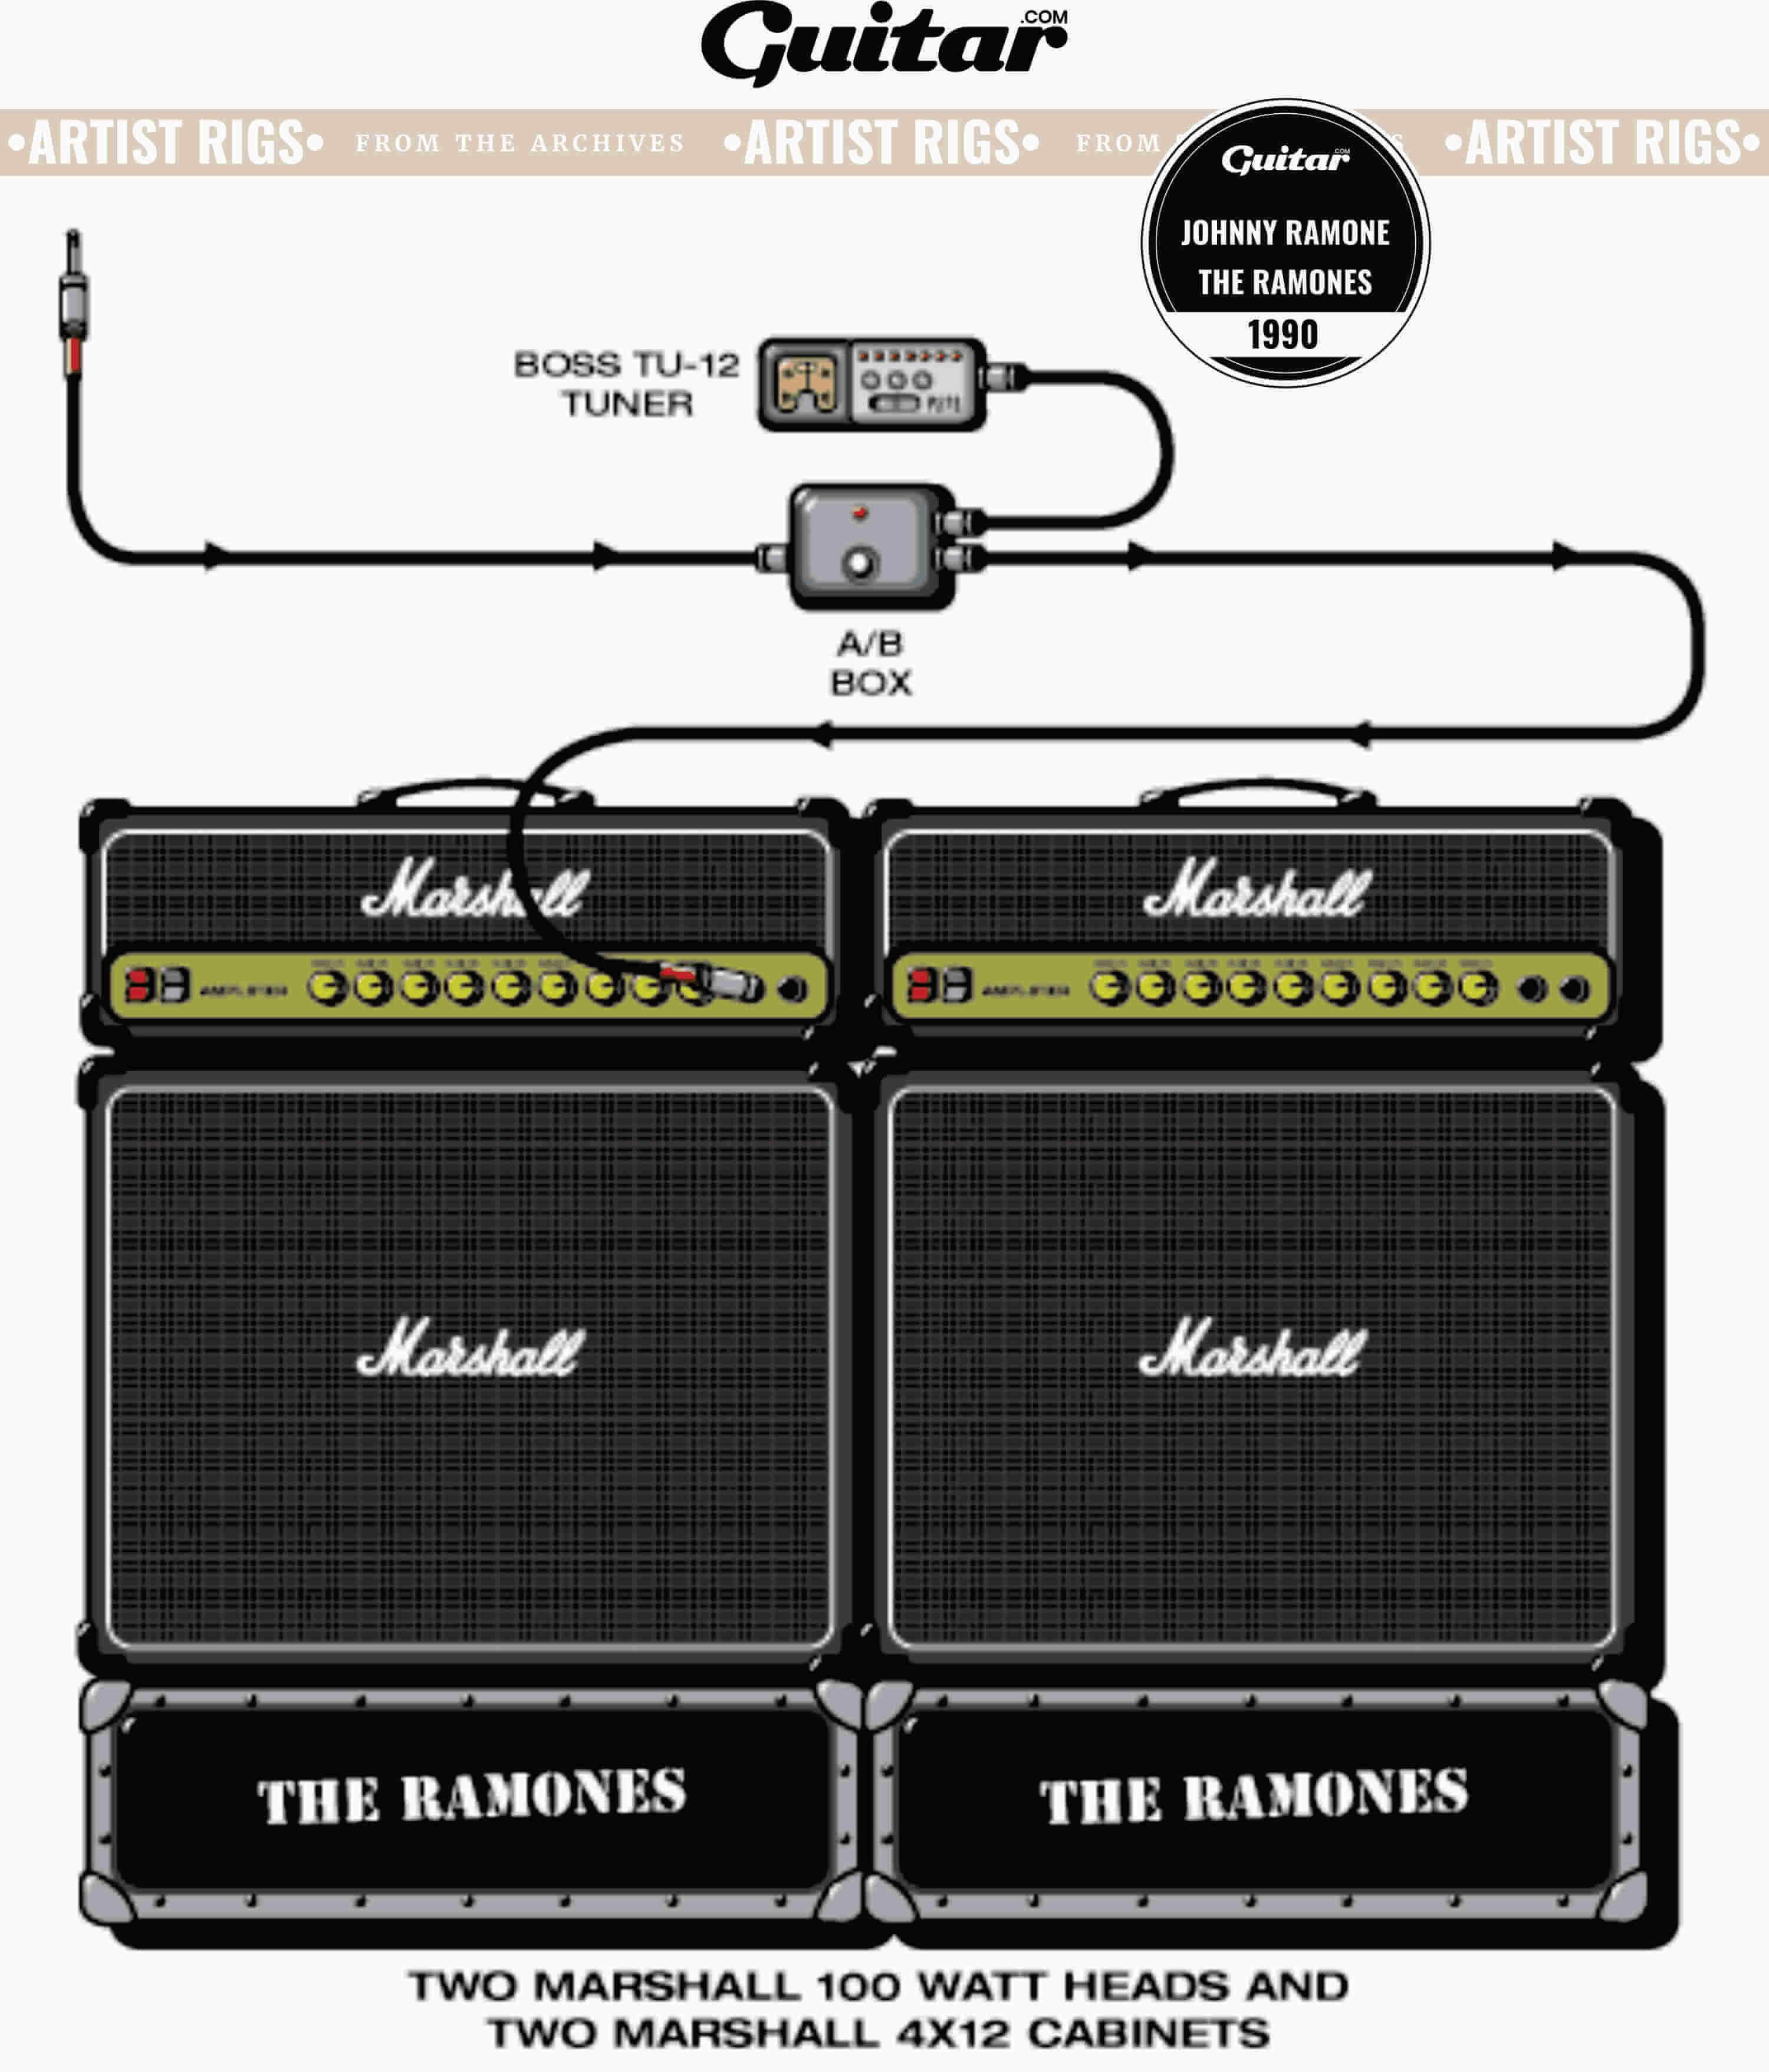 Rig Diagram: Johnny Ramone, The Ramones (1996)